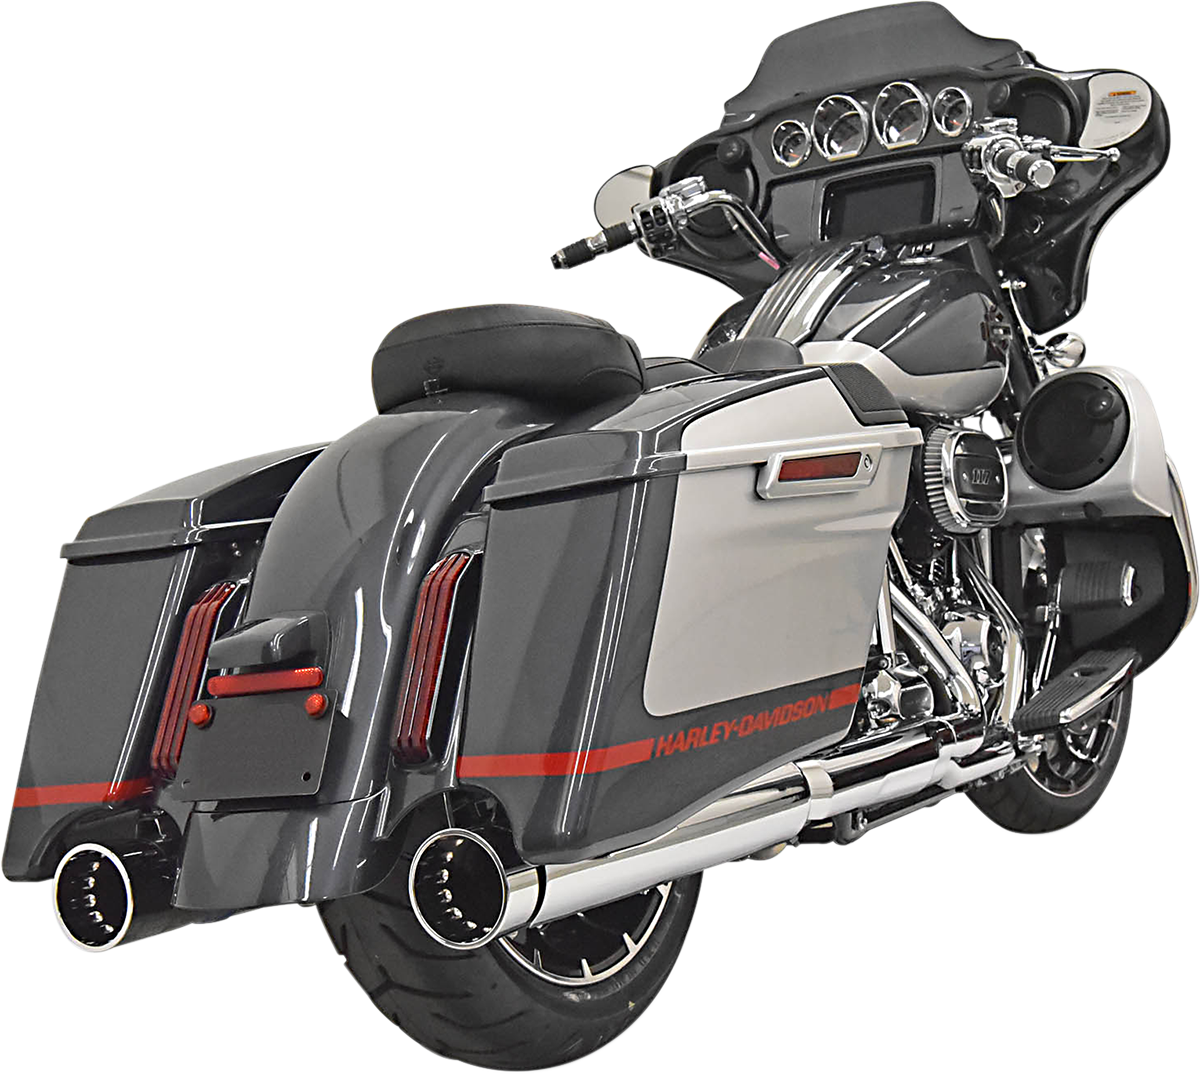 "Bassani Chrome 4"" DNT Slip on Mufflers for 17-19 Harley M8 CVO Touring FLHXSE"